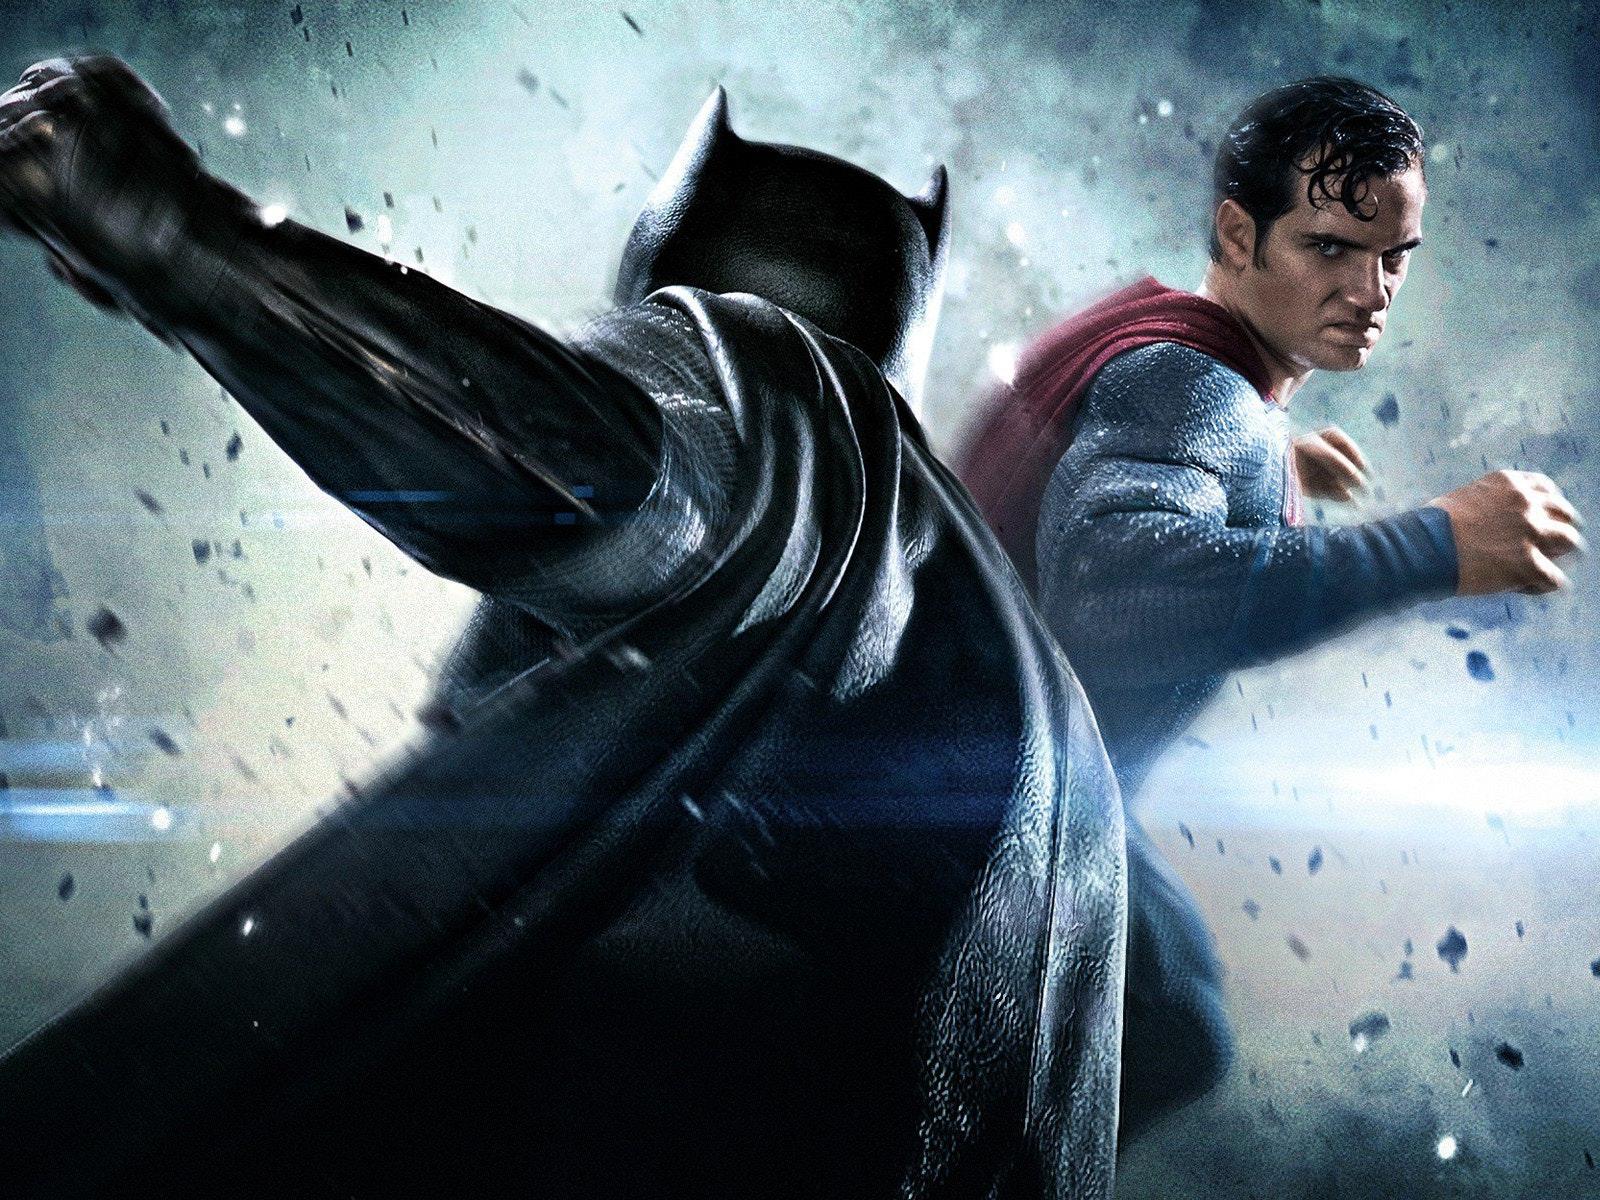 Deadpool and Spider-Man Diss 'Batman v Superman' in New Marvel Comic